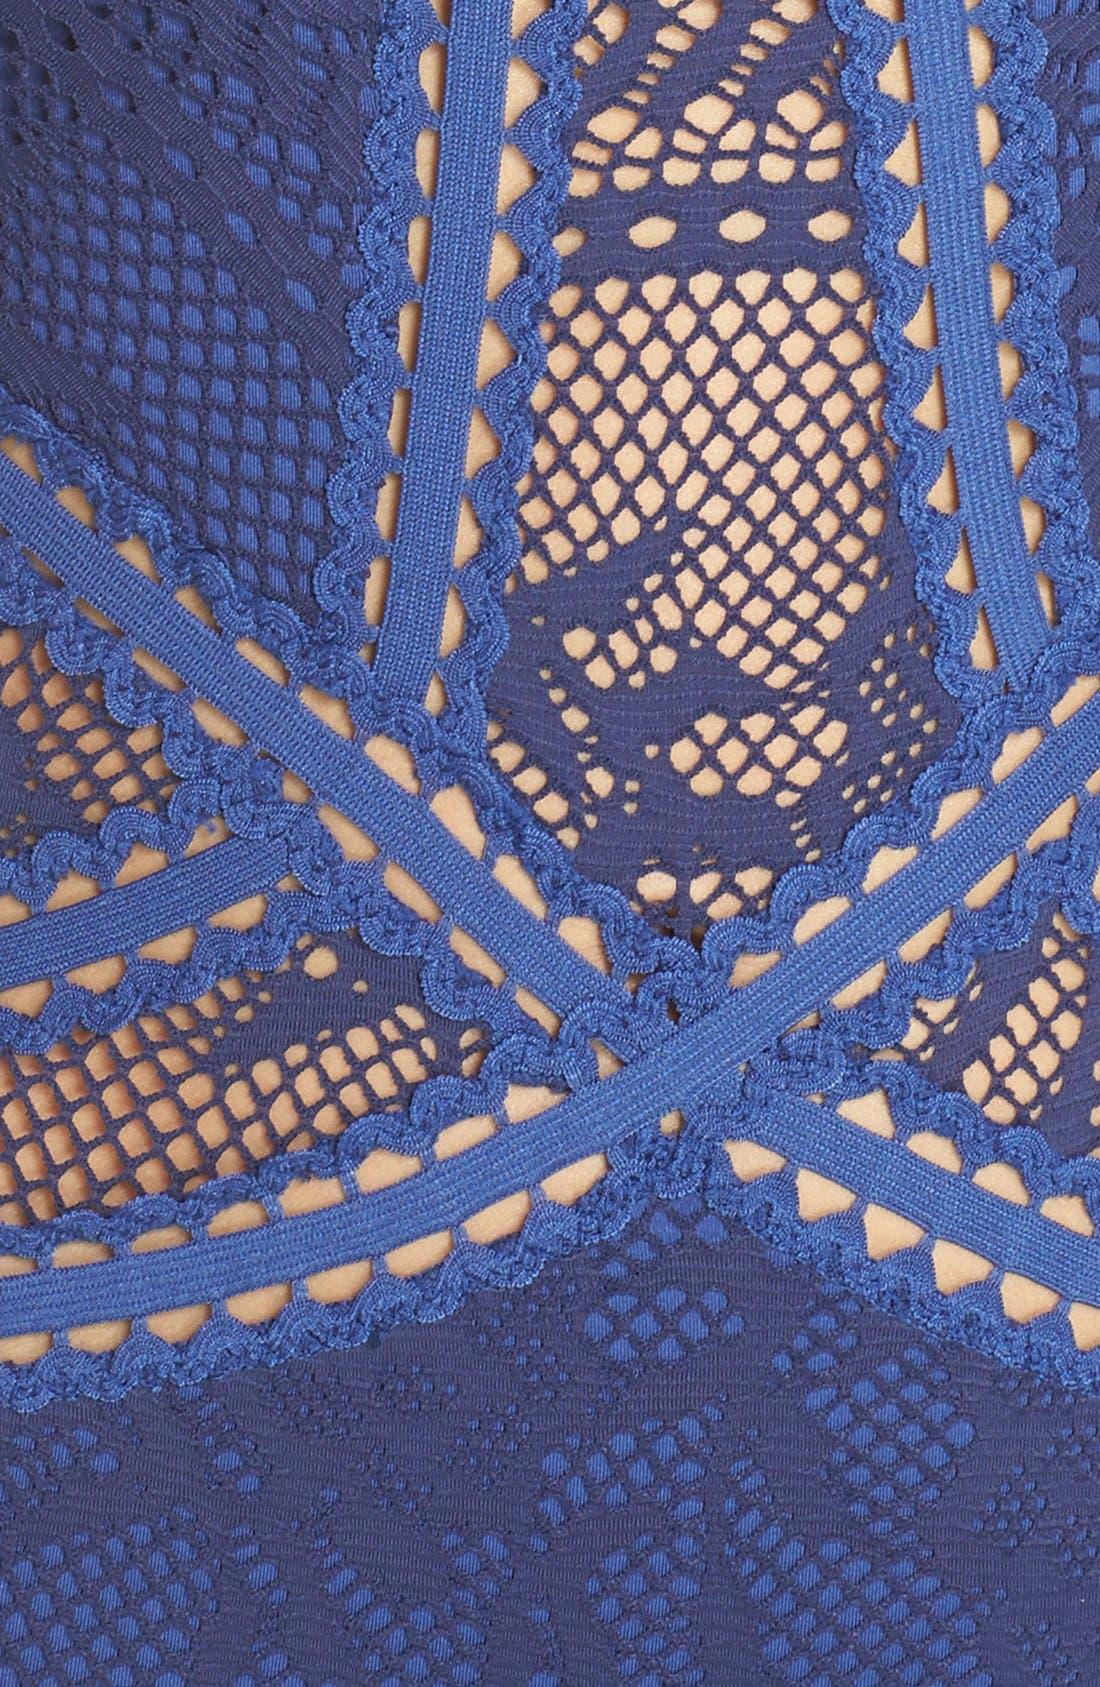 Prairie Rose Crochet One-Piece Swimsuit,                             Alternate thumbnail 13, color,